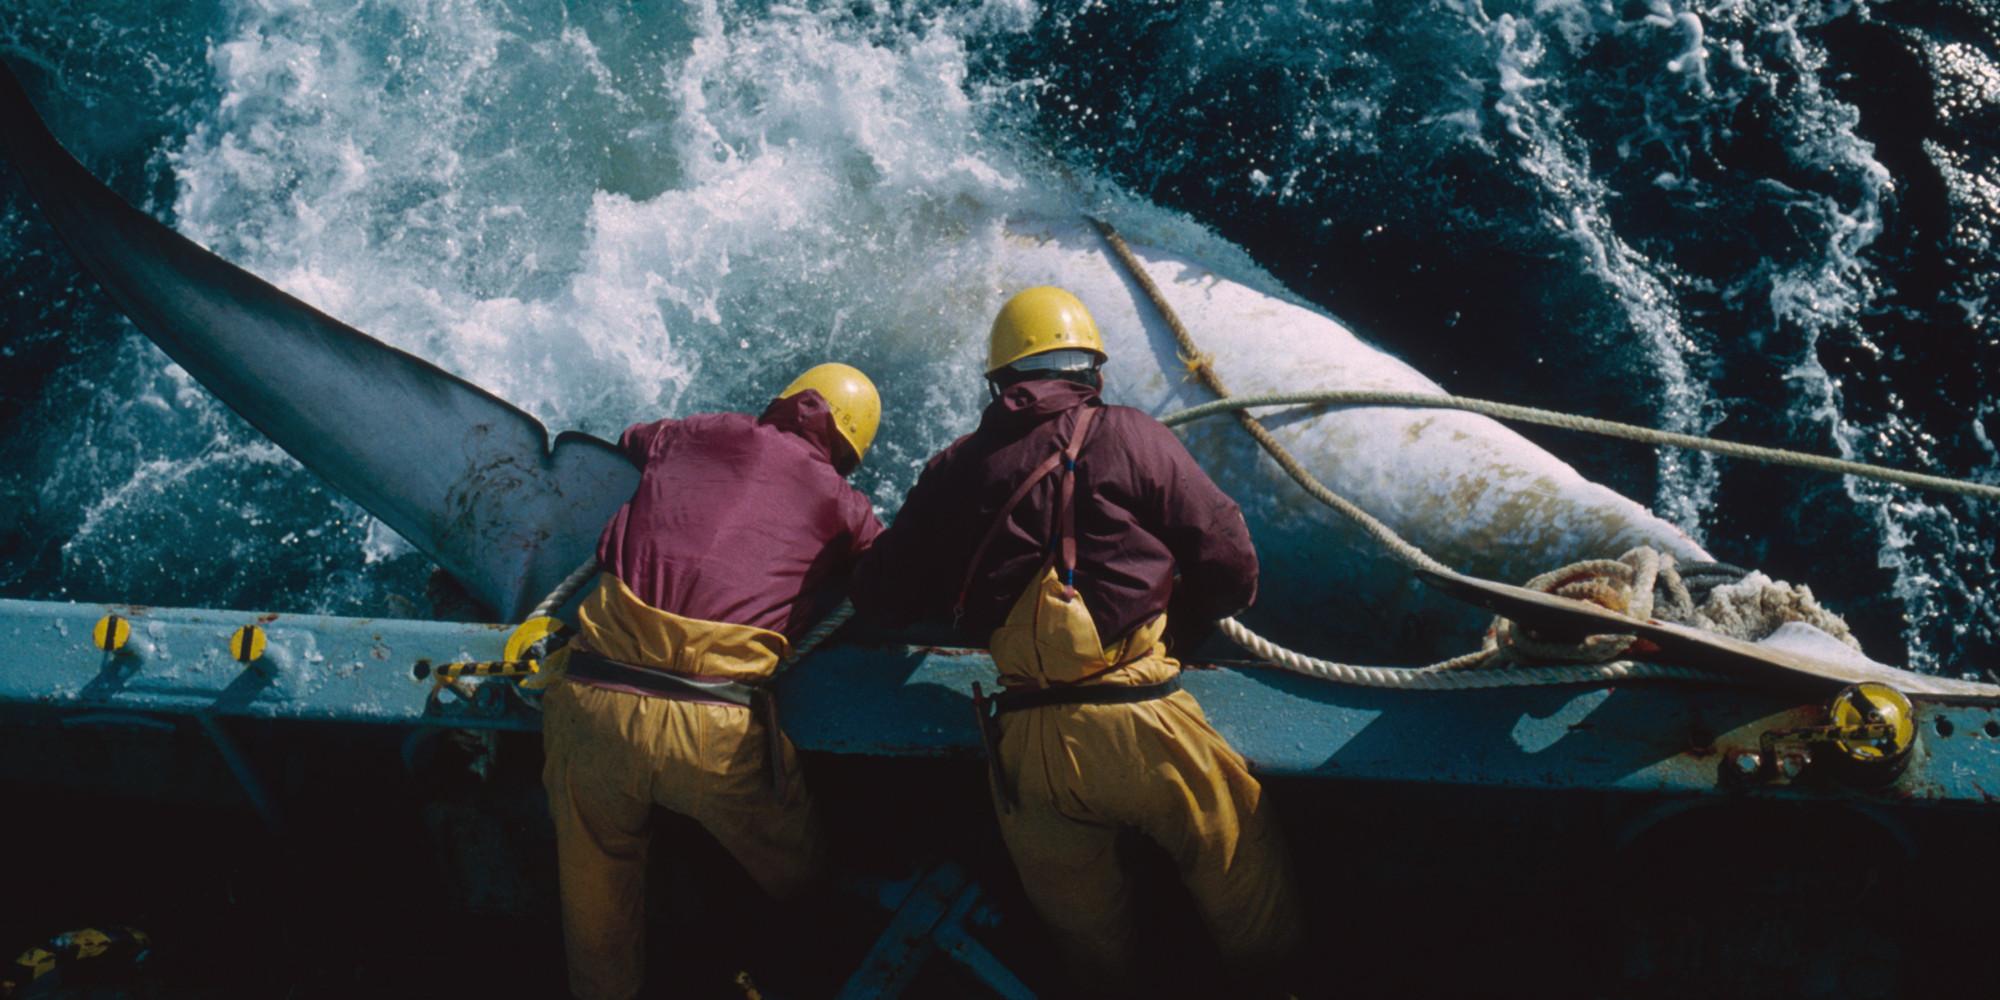 Antarctic Whaling: Japan Seeks To Resume Lethal Research